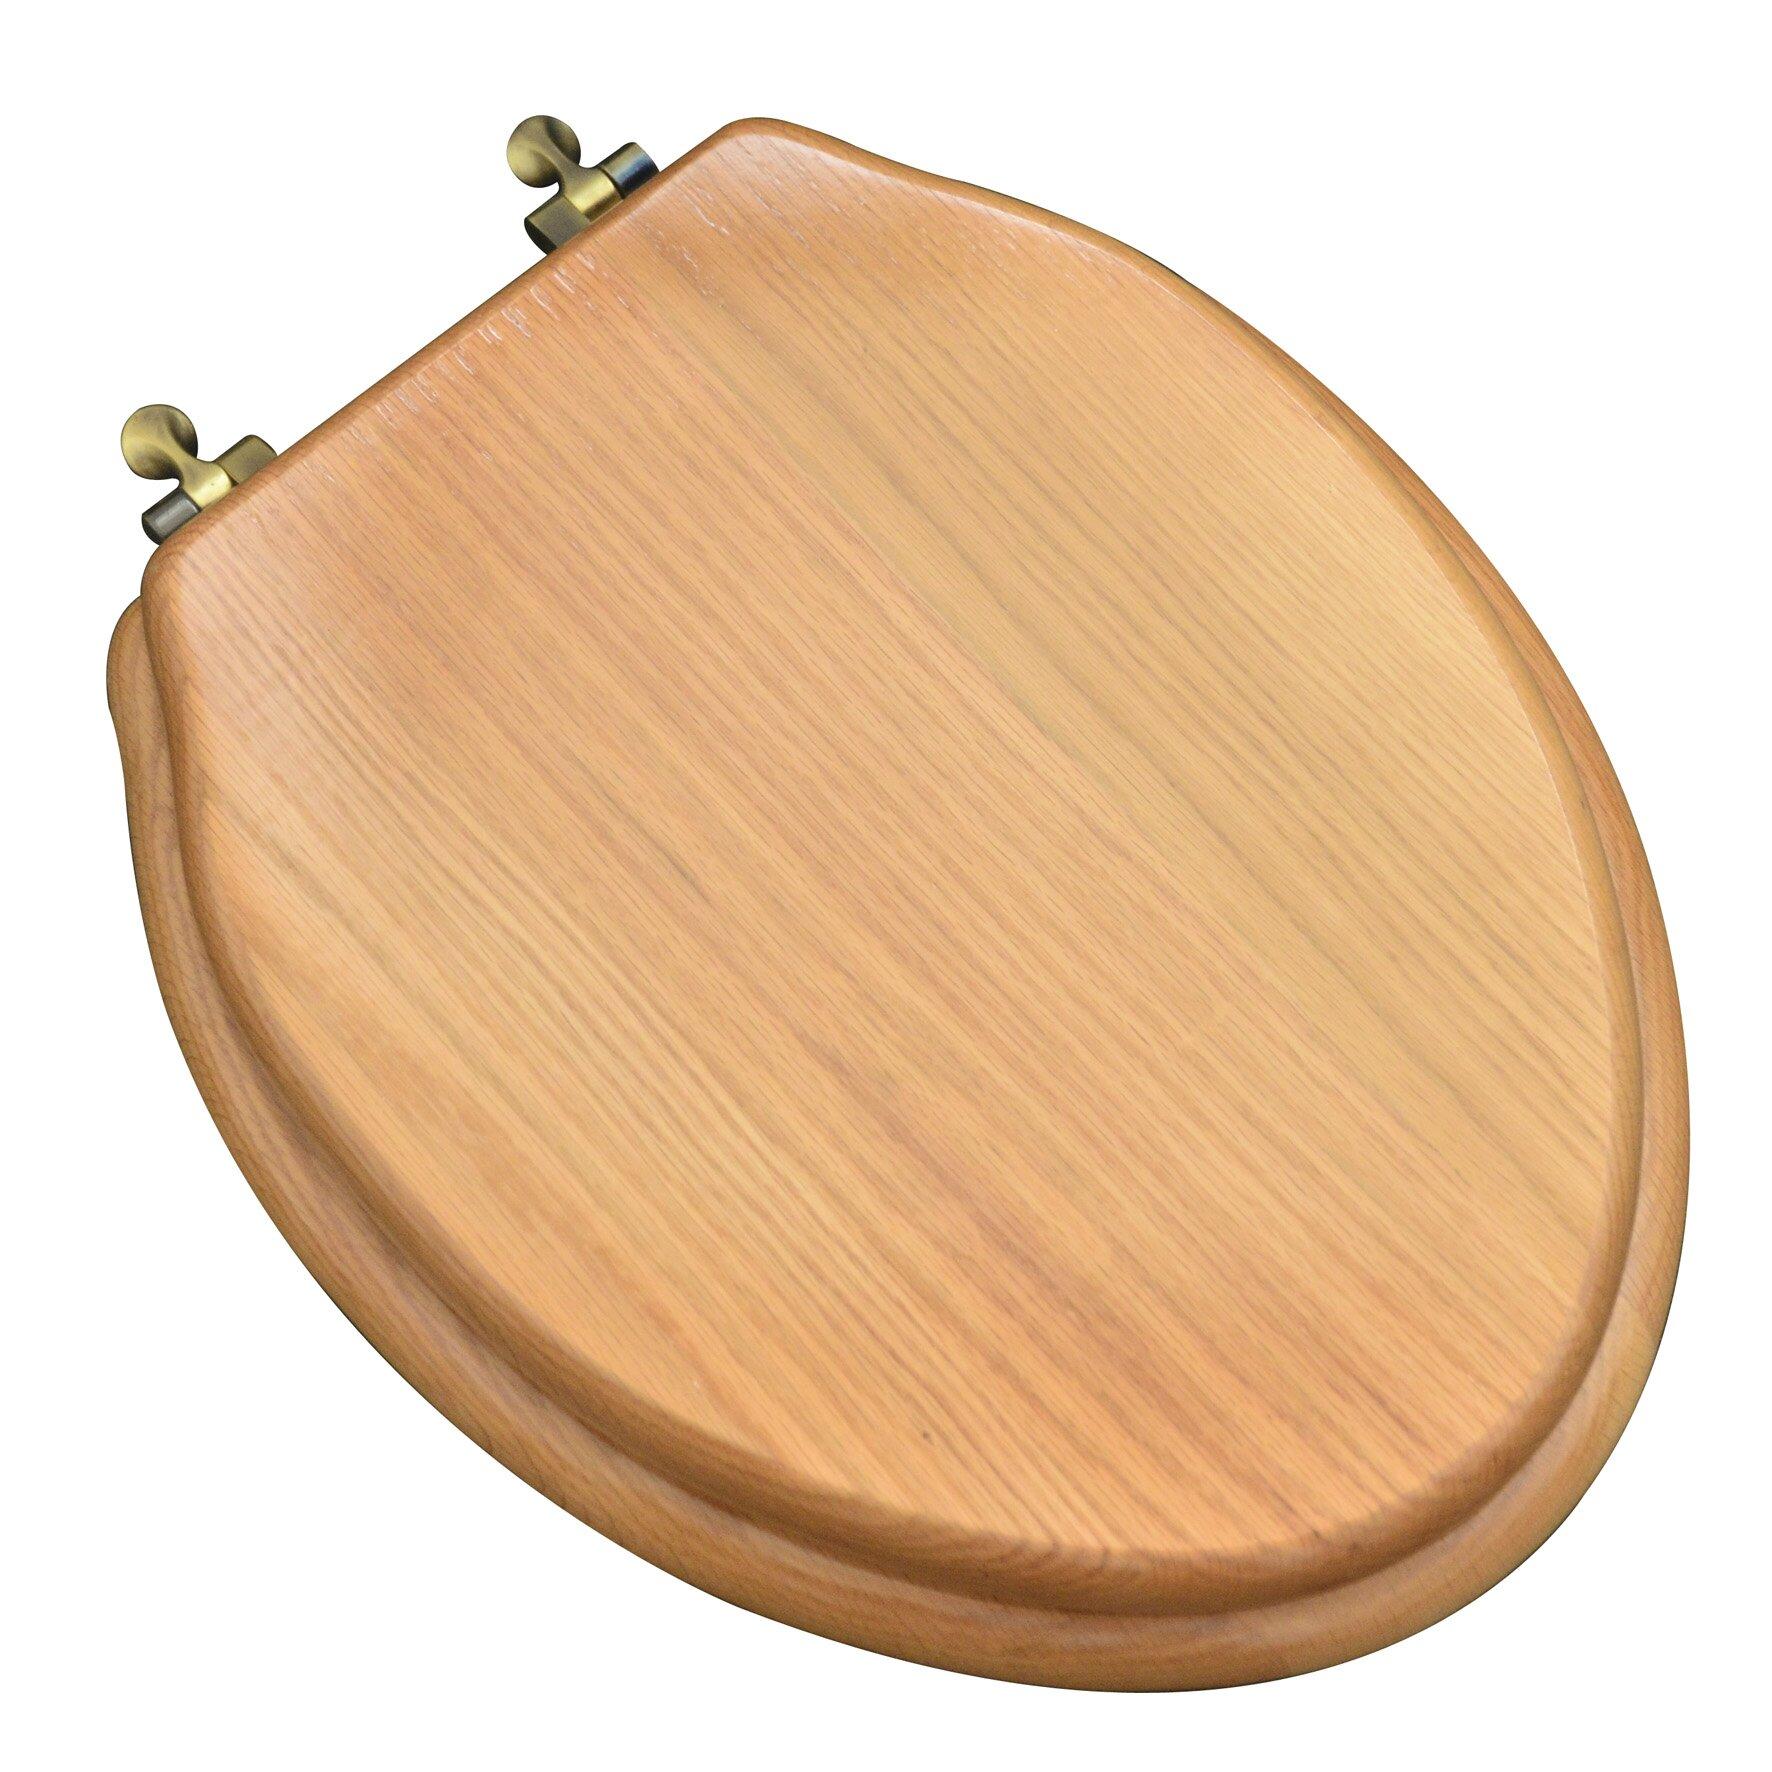 Plumbingtechnologiesllc Designer Solid Oak Wood Elongated